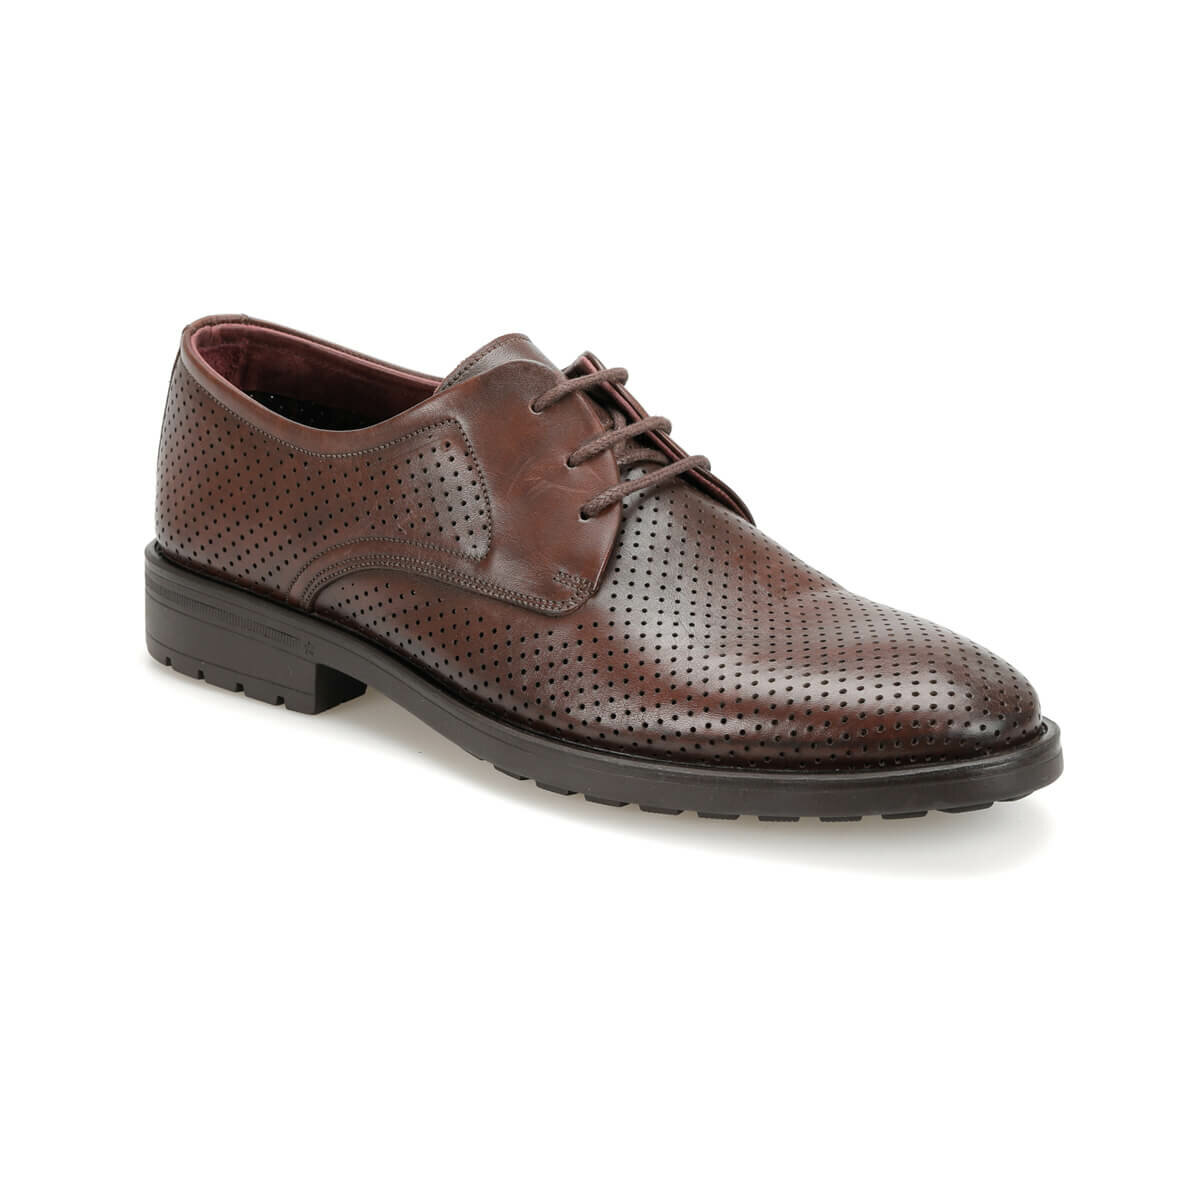 FLO FL58 Brown Men Shoes Garamond